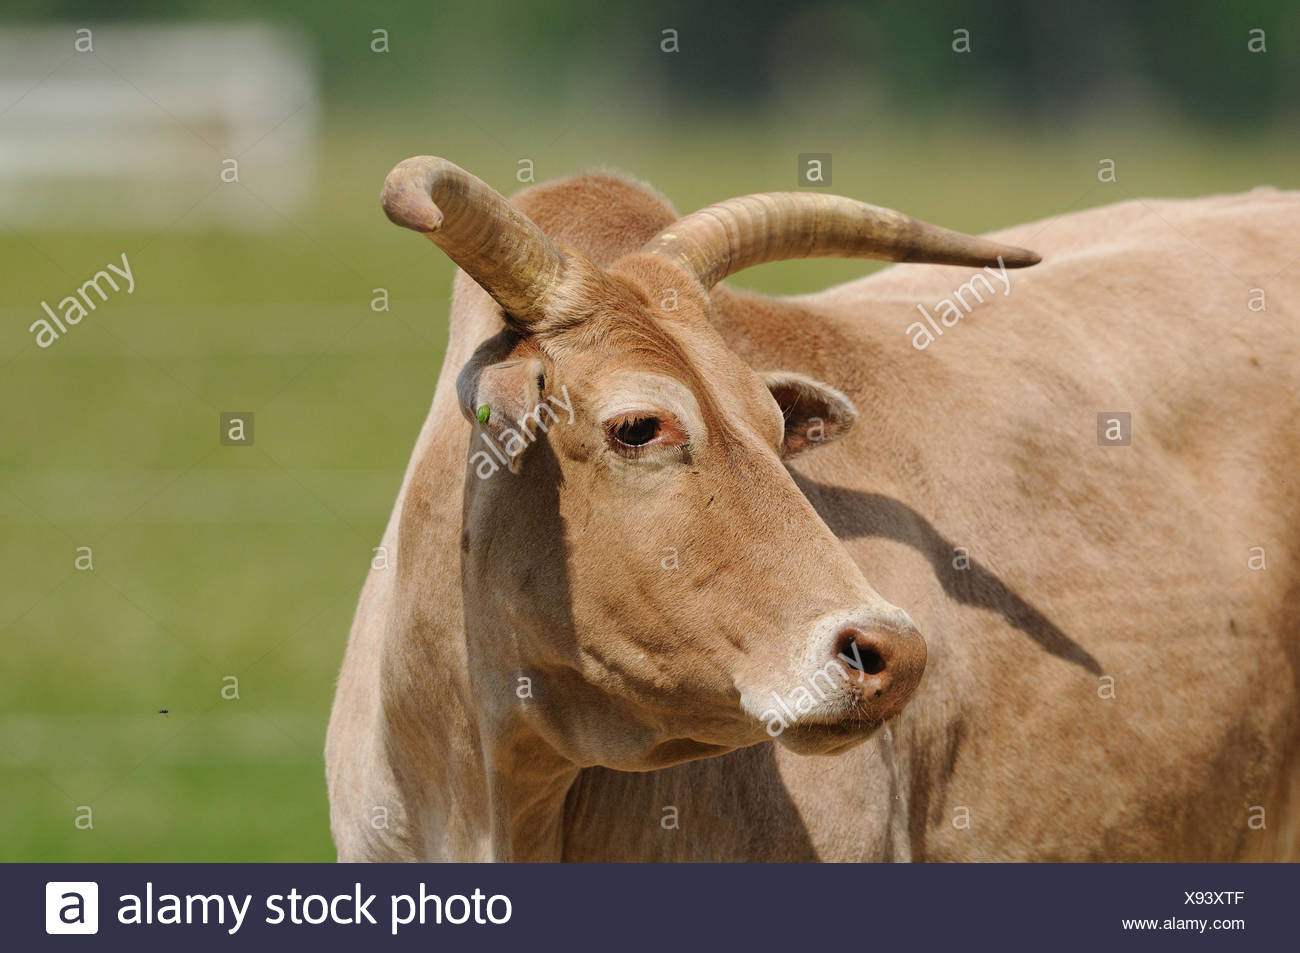 Domestic cattle, Bos primigenius taurus, portrait, side view, Stock Photo